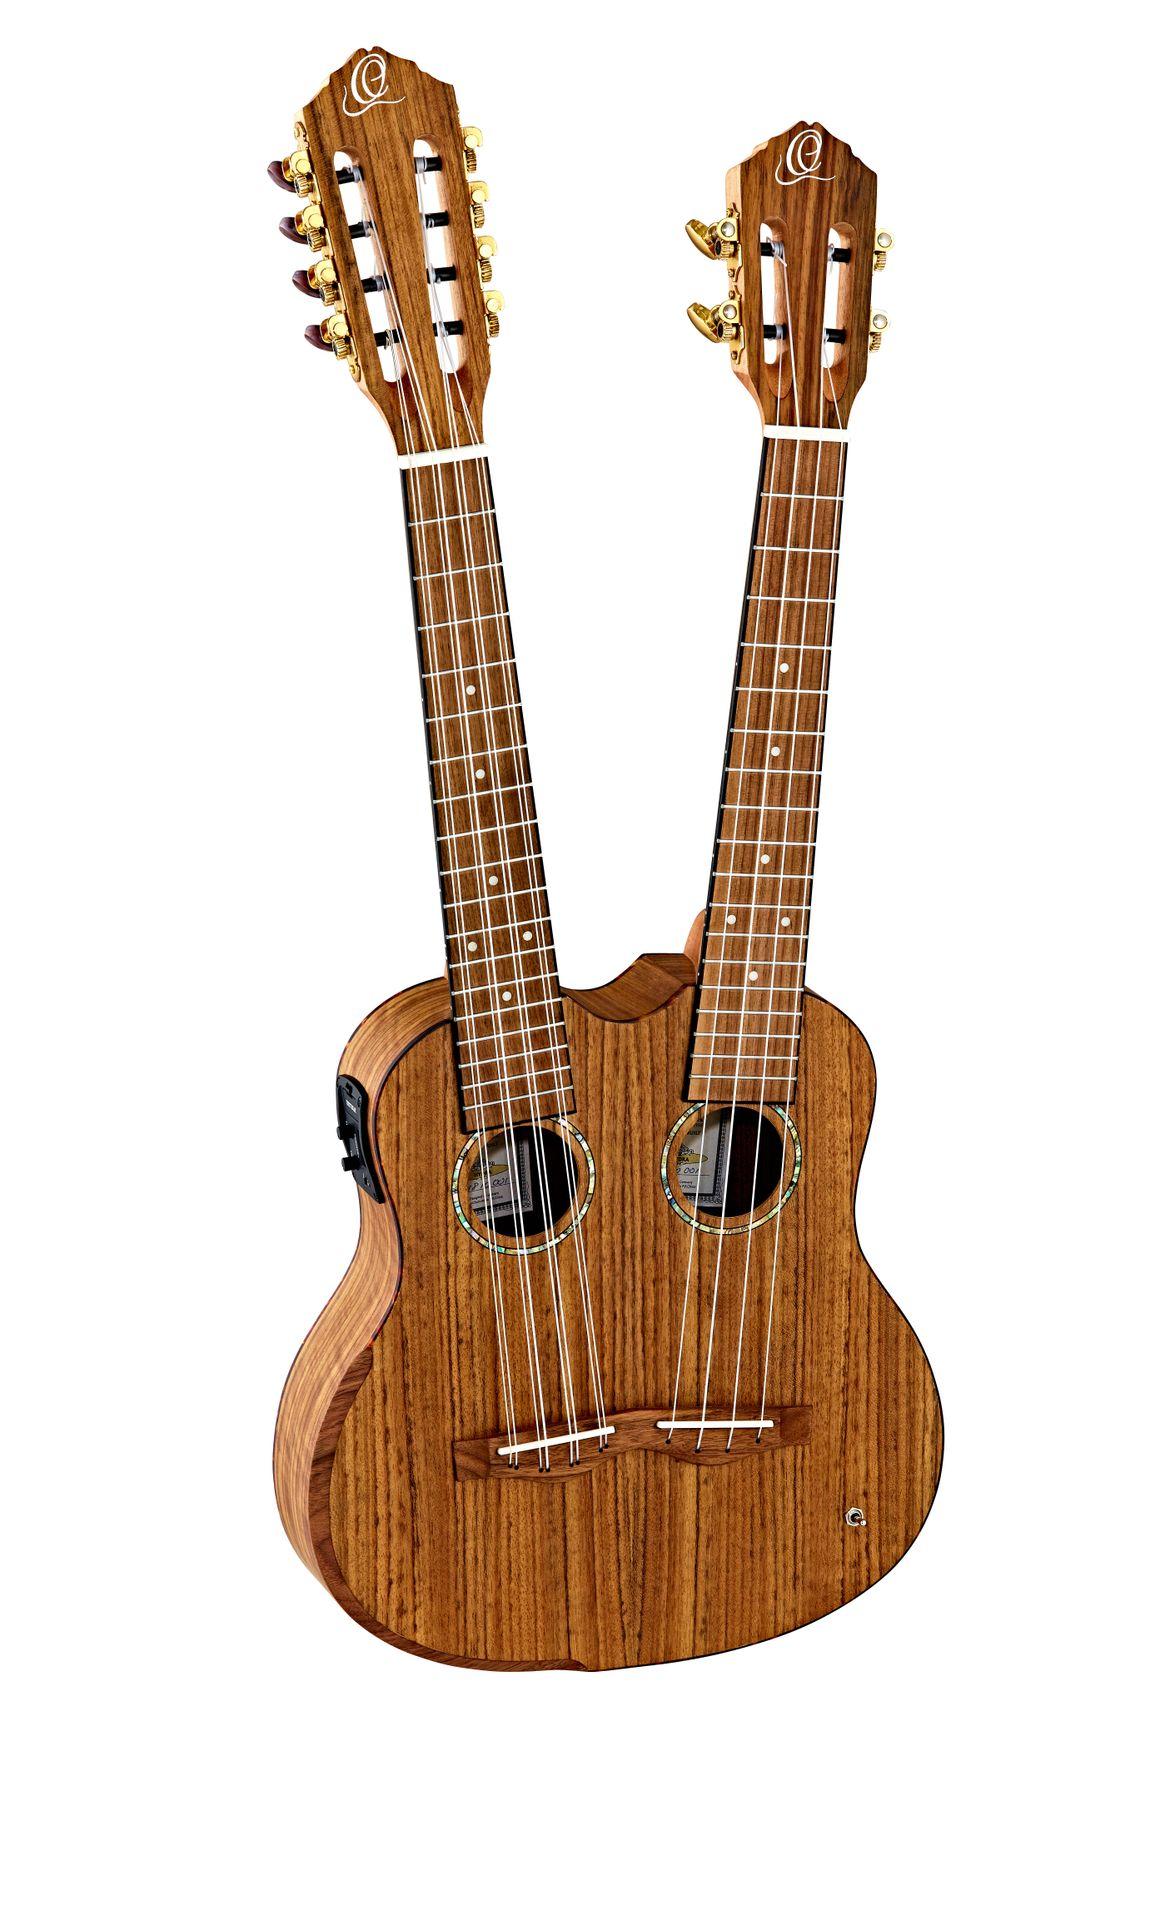 Ortega HYDRA Double Neck Tenor Ukulele 4/8 String incl. Gigbag